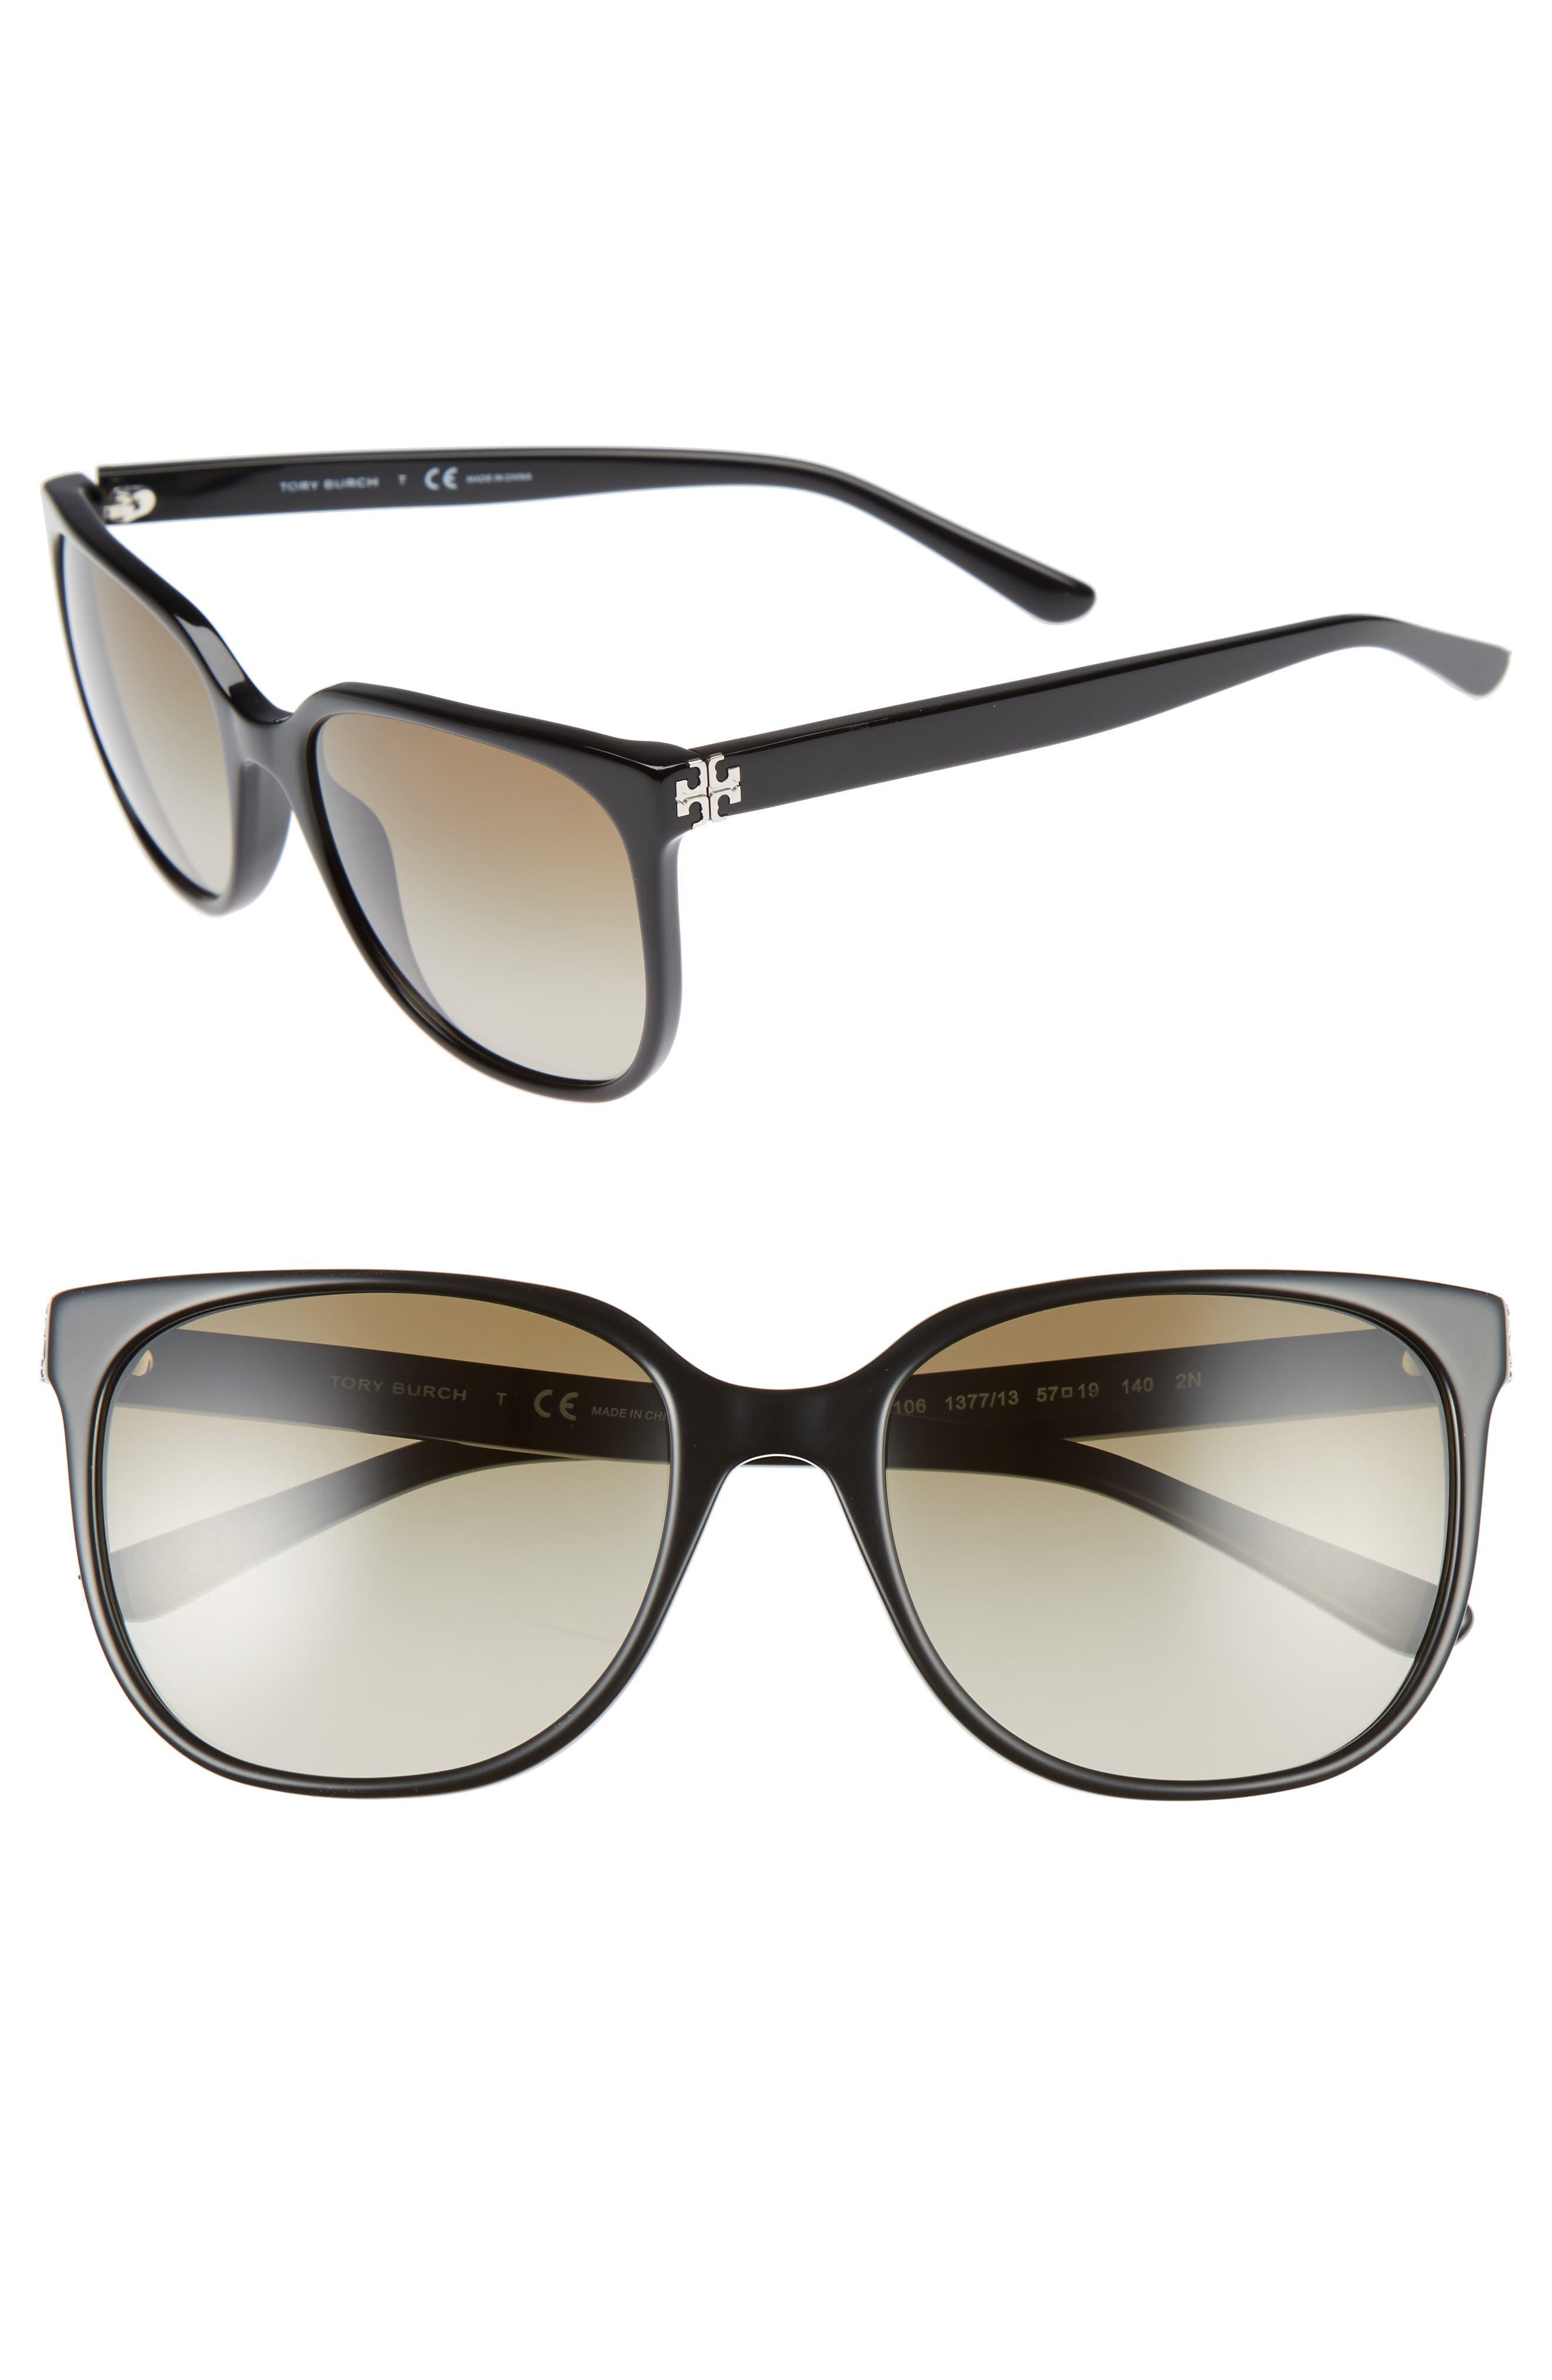 Main Image - Tory Burch 57mm Gradient Sunglasses